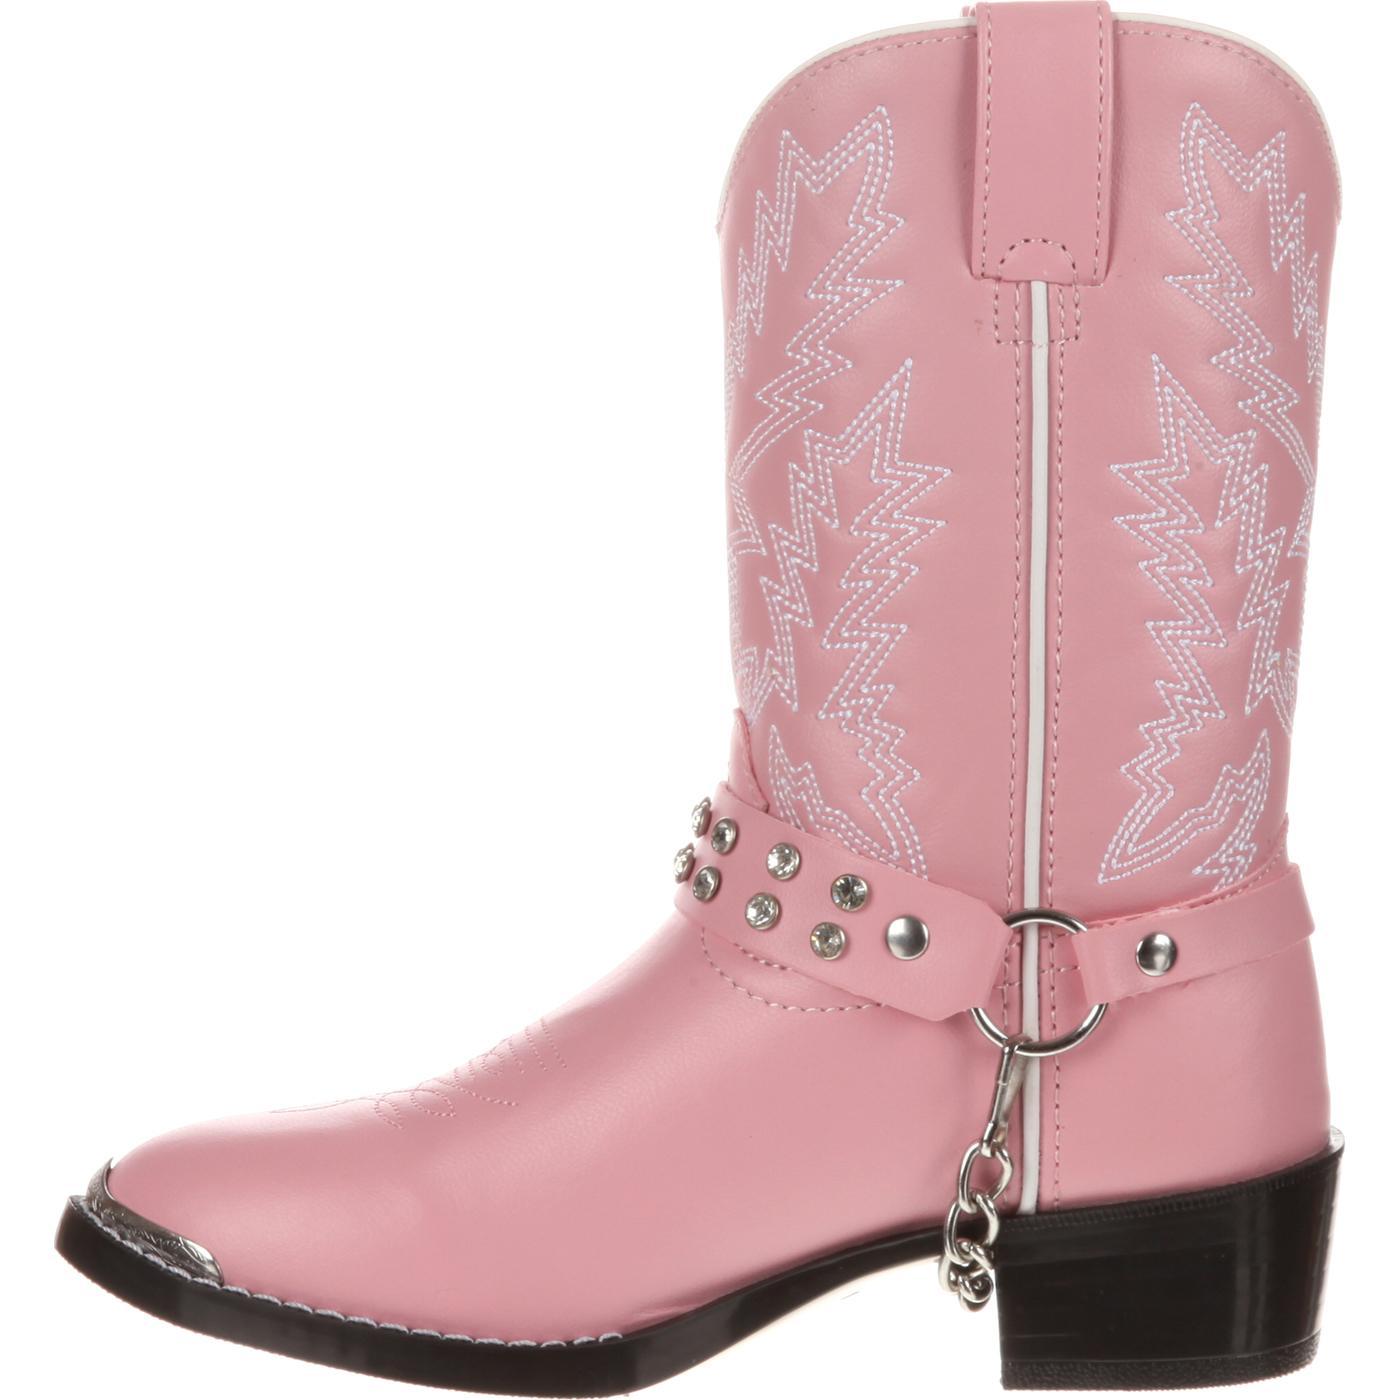 c87a7b28828488 Images. Durango Little Kid Pink Rhinestone Western Boot ...